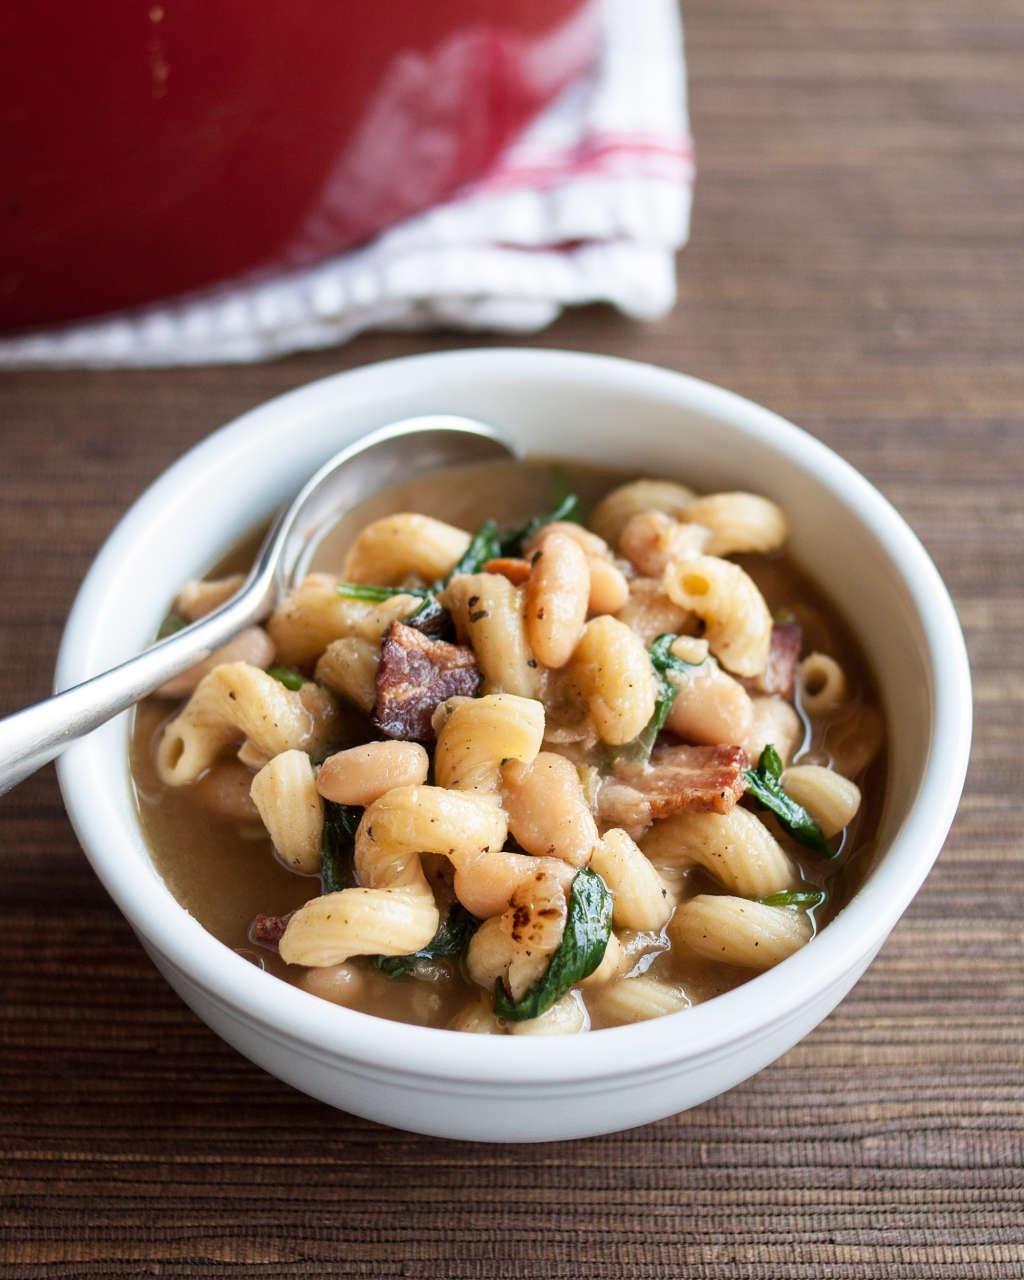 Recipe: One-Pot Pasta e Fagioli (Italian Pasta and Bean Stew)